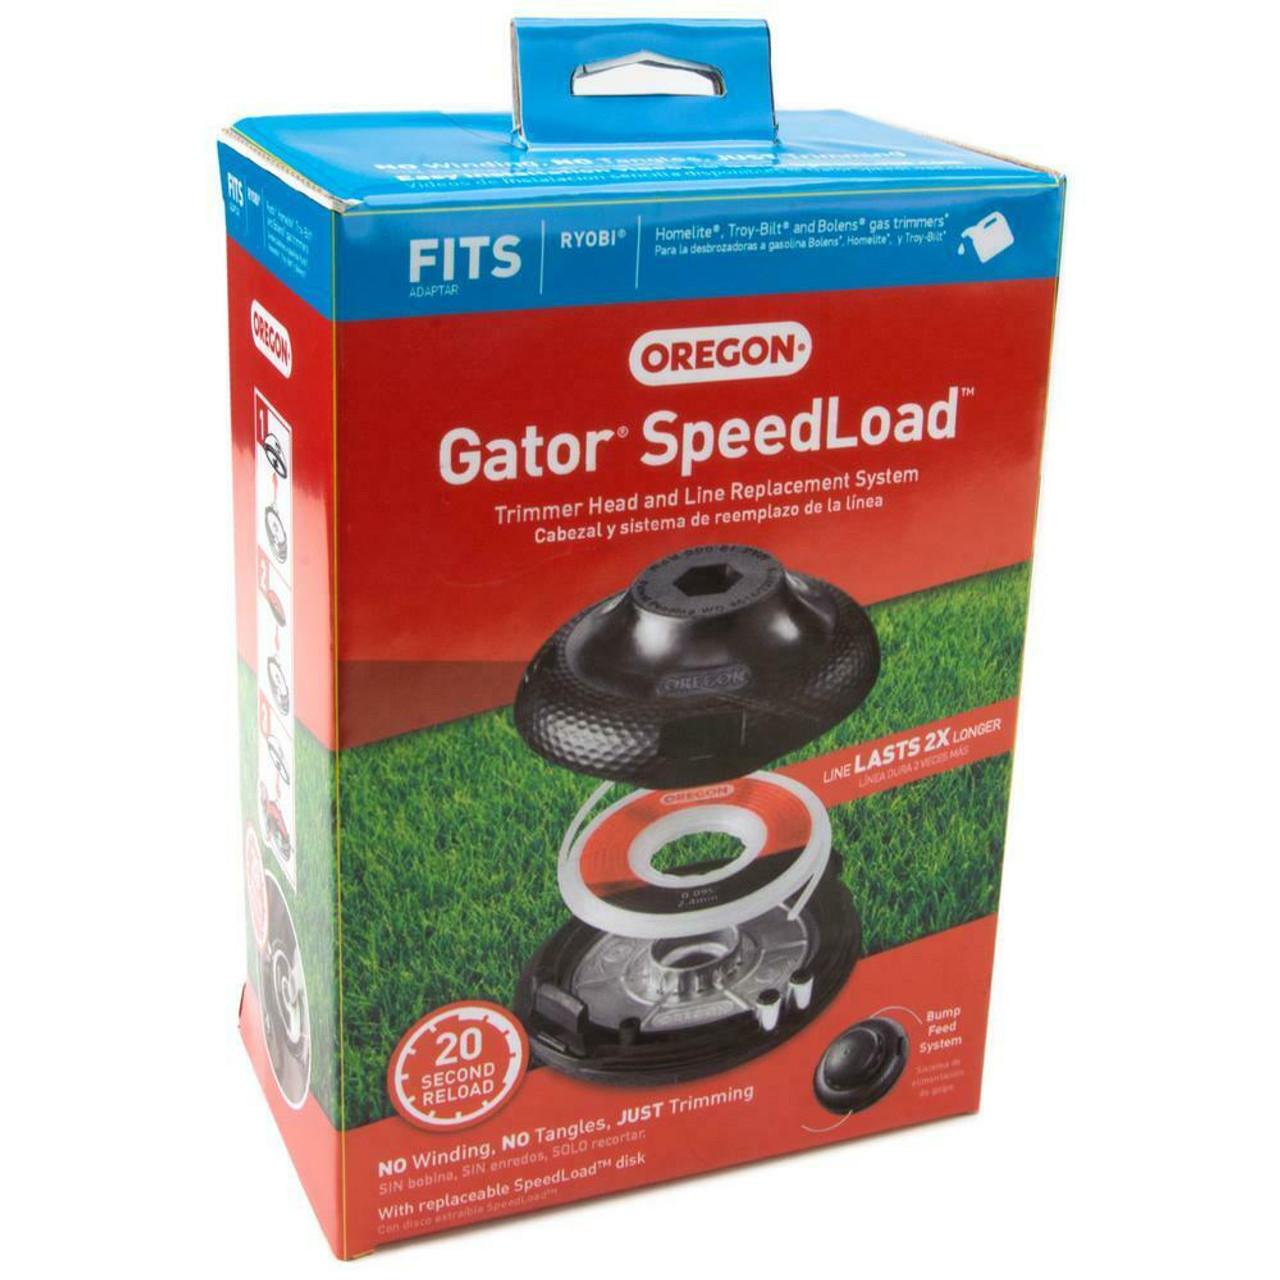 Oregon Gator Speedload Trimmer Head & Line Replacement System Line 24-200-R